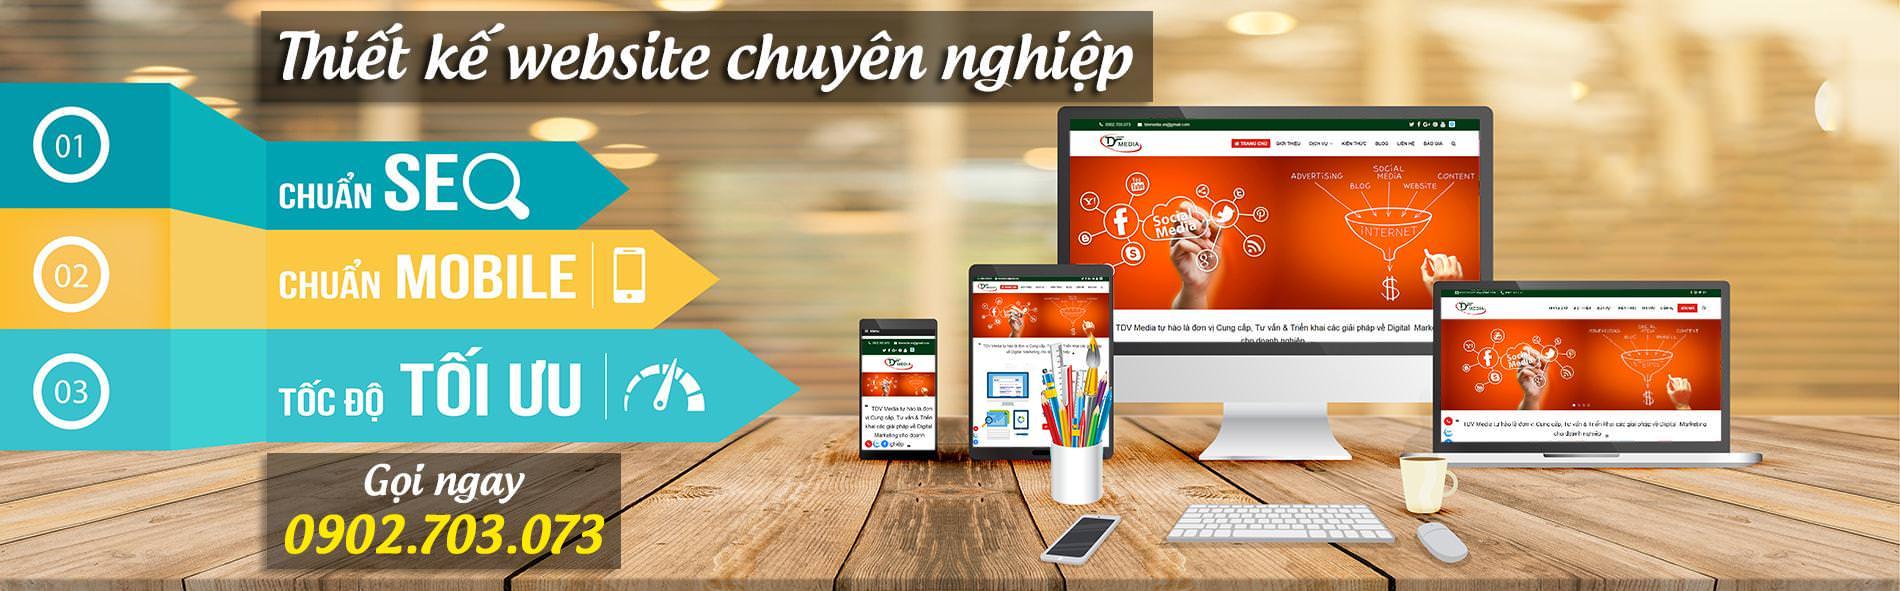 dịch vụ thiết kế website 3cmedia